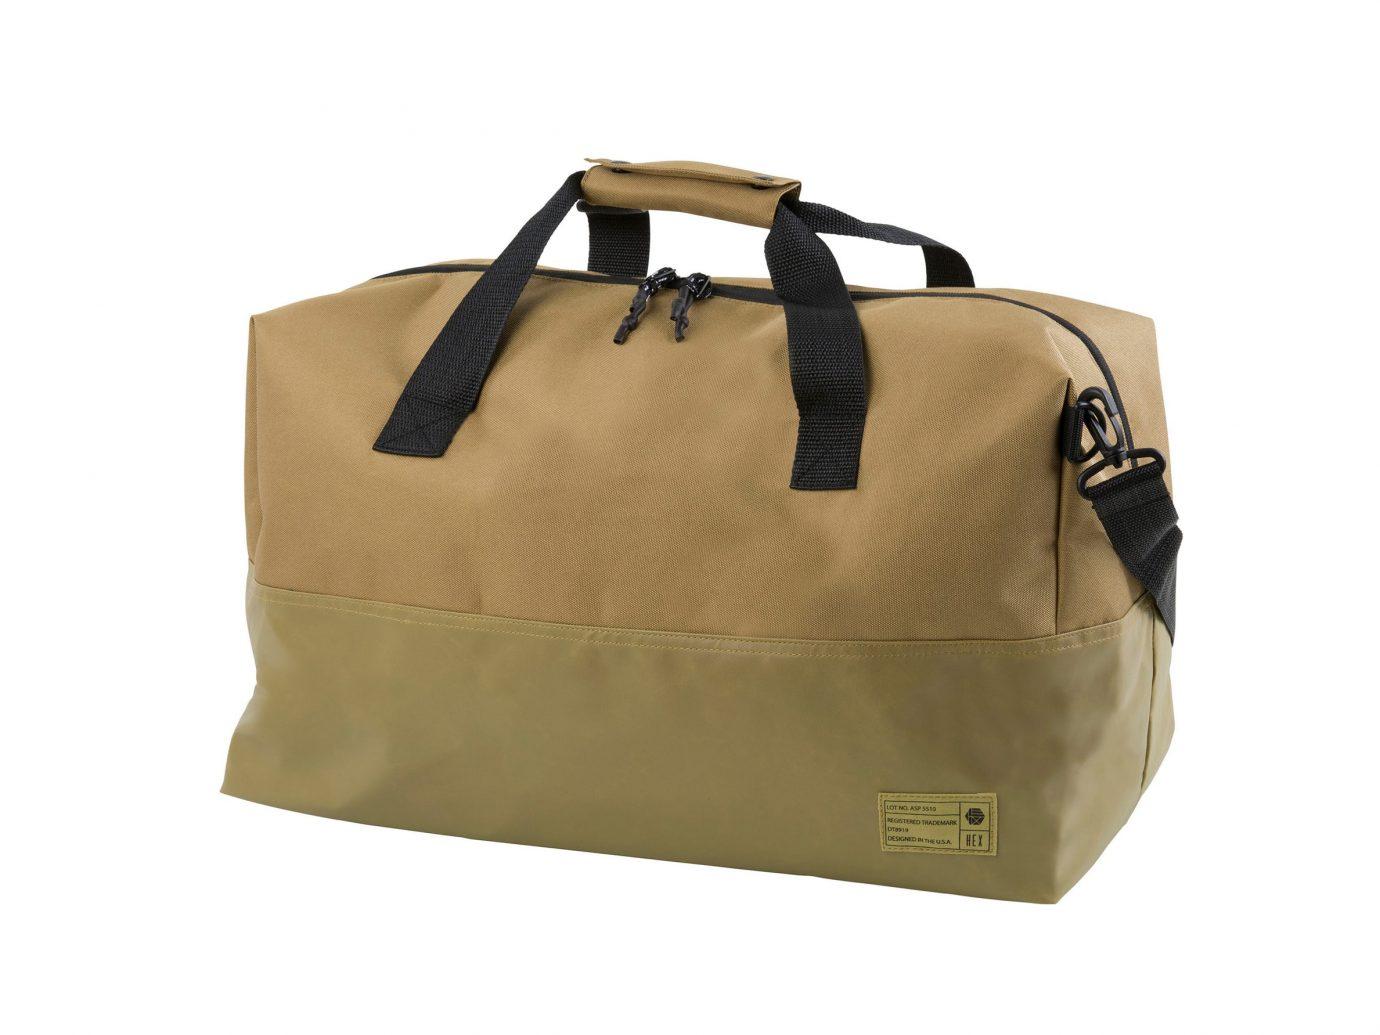 Best Weekend Bags Hex Aspect Duffel Bag